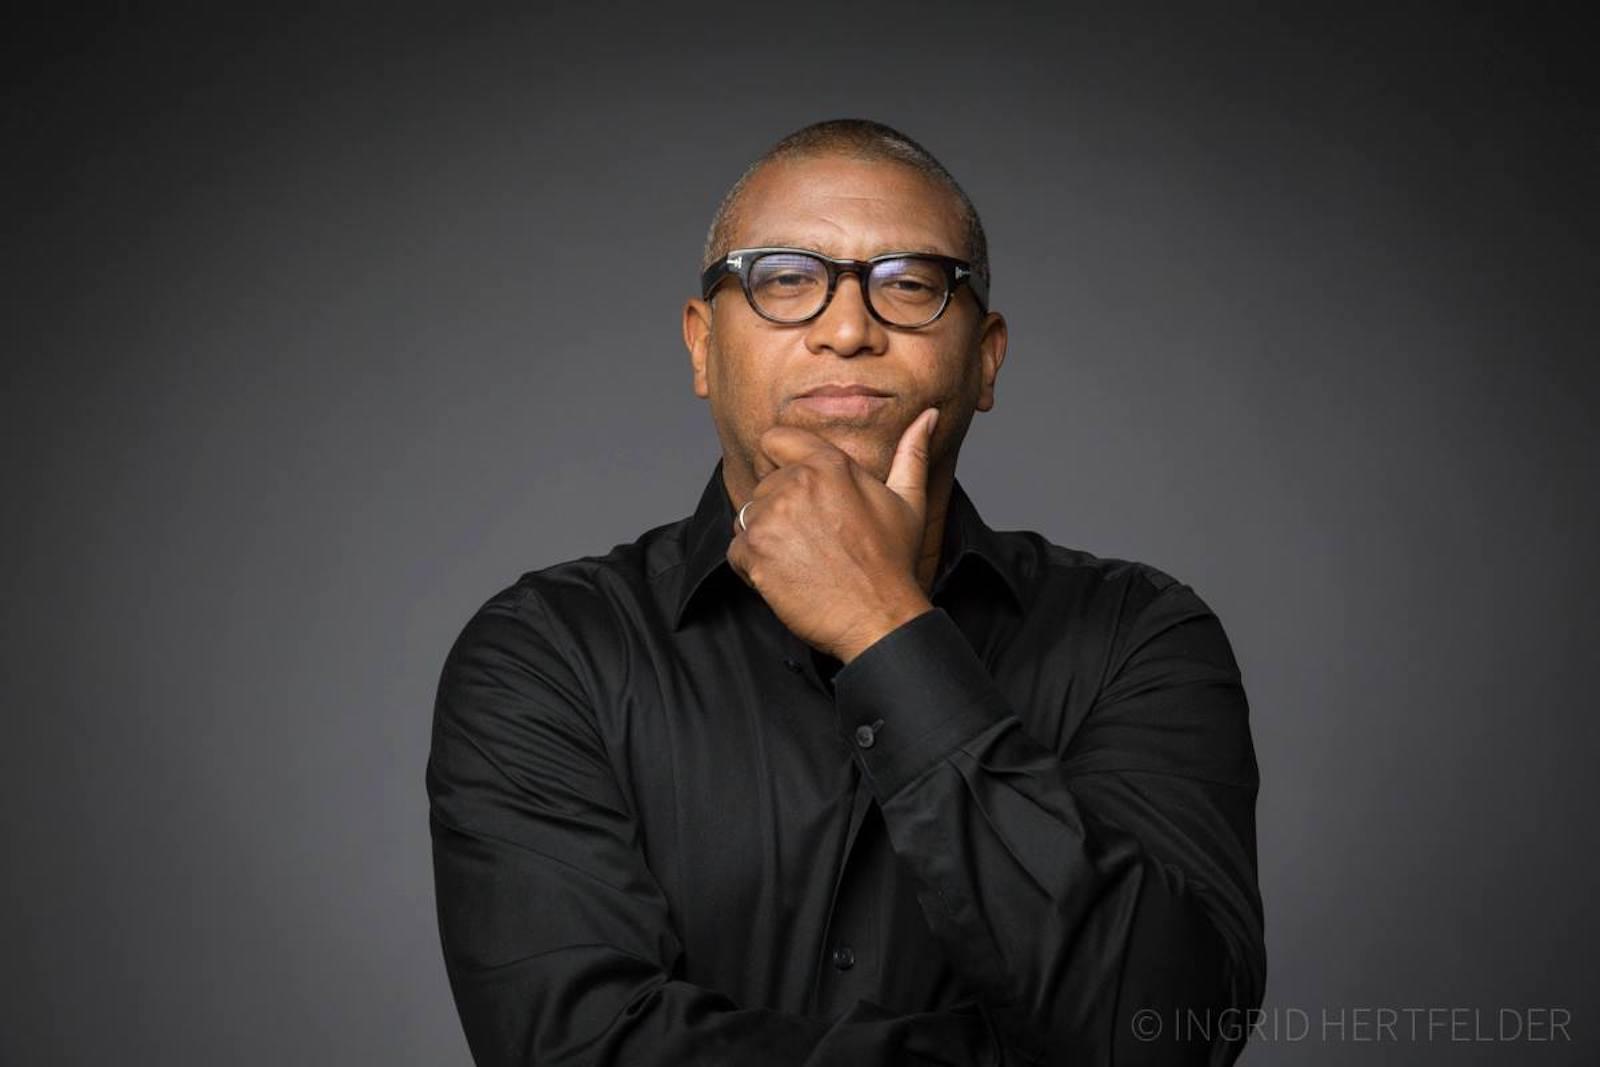 Reginald Hudlin, African American Film, Black Film, African American Director, Black Director, African American Cinema, KOLUMN Magazine, KOLUMN, KINDR'D Magazine, KINDR'D, Willoughby Avenue, Wriit,